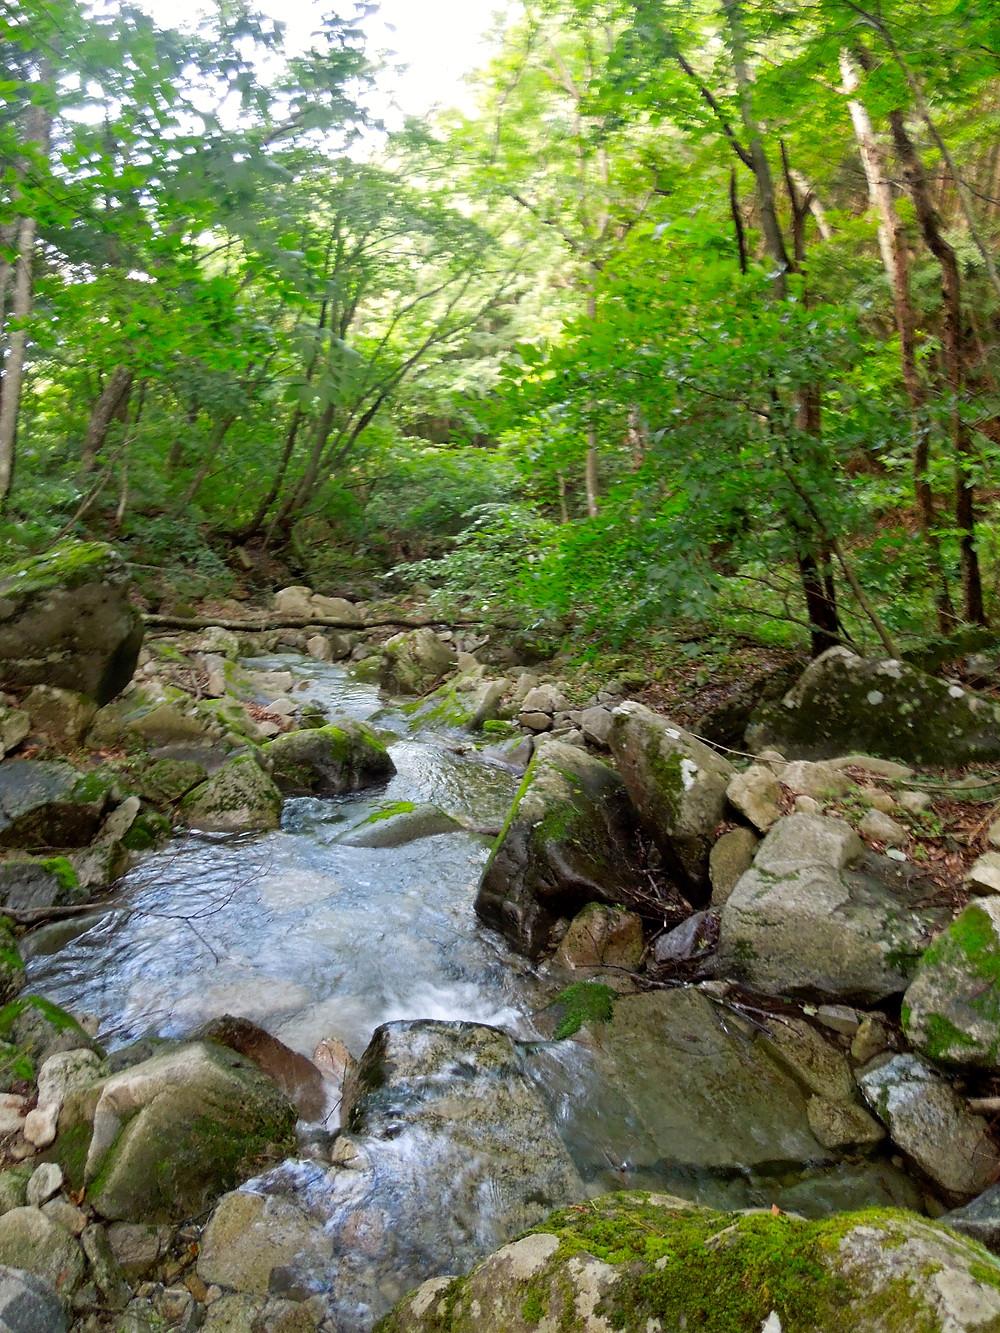 Misaka hiking